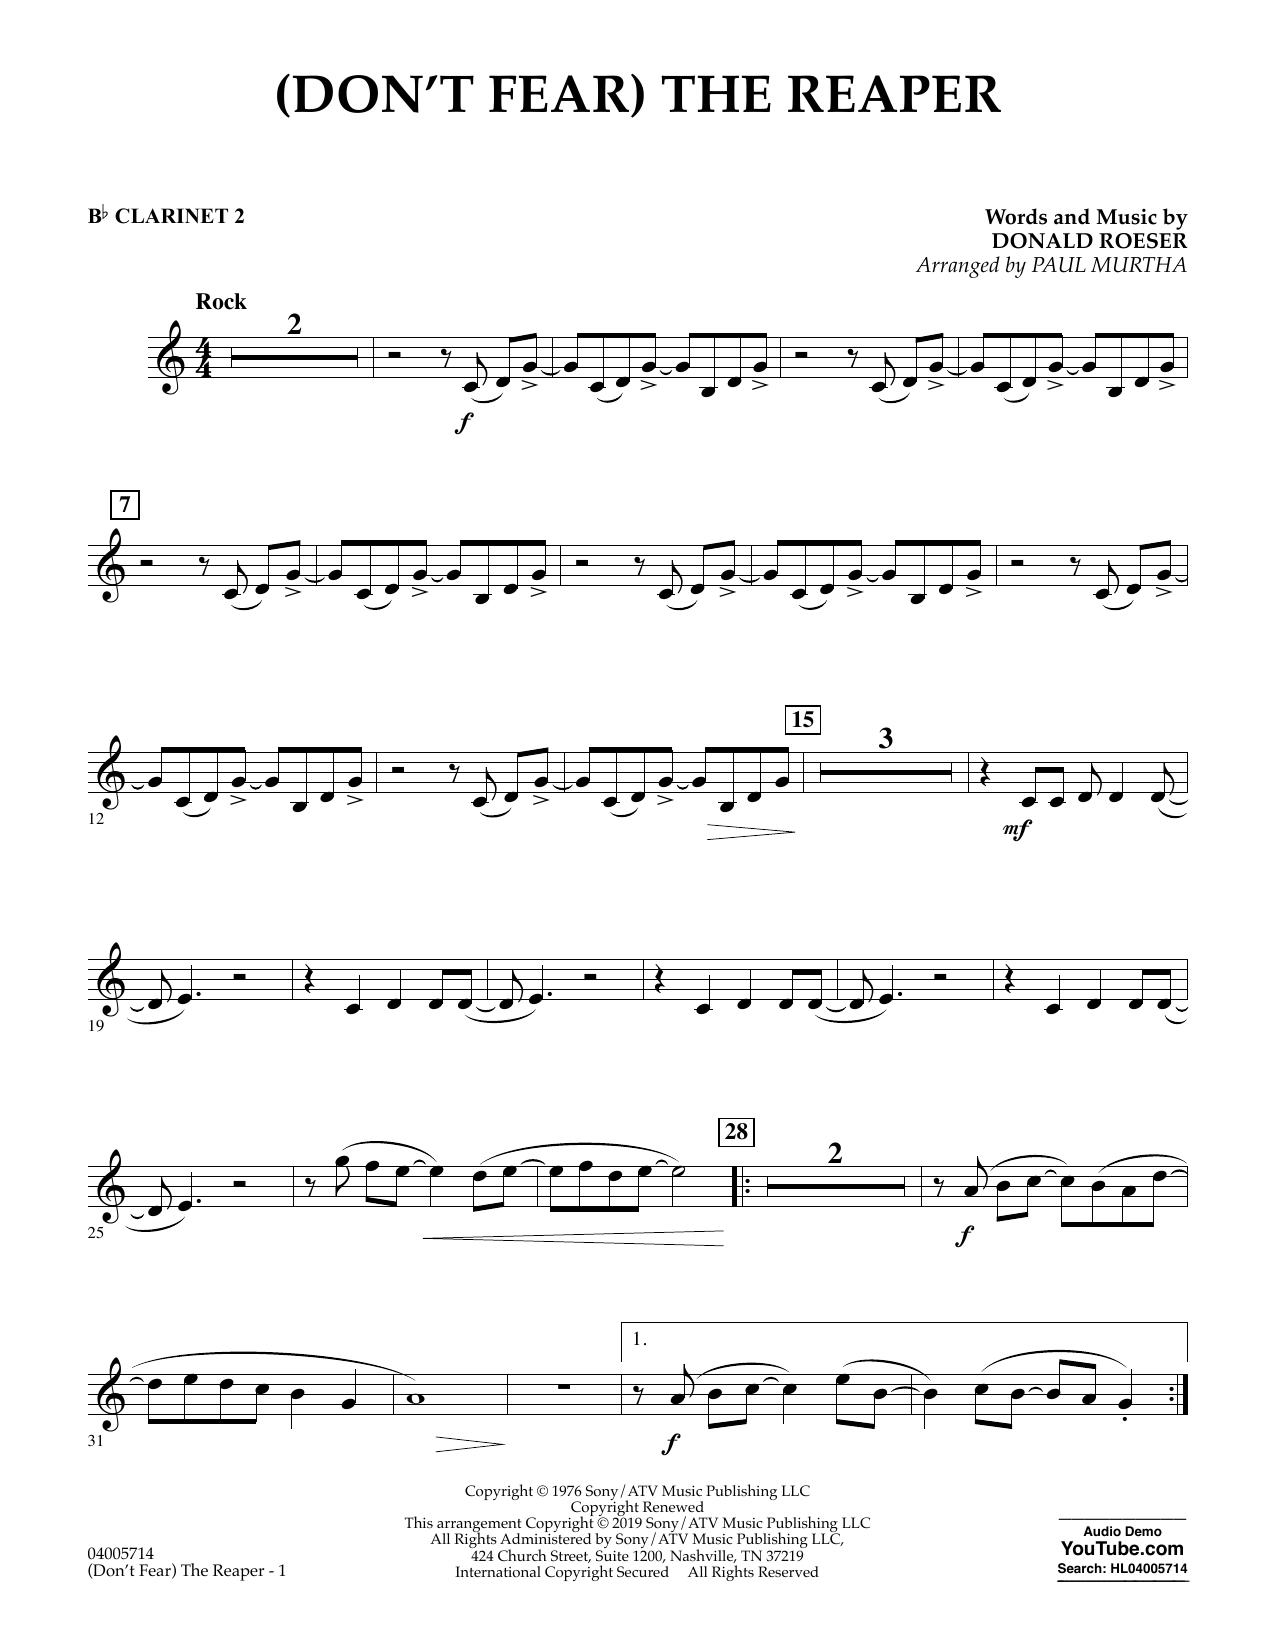 (Don't Fear) The Reaper (arr. Paul Murtha) - Bb Clarinet 2 (Concert Band)